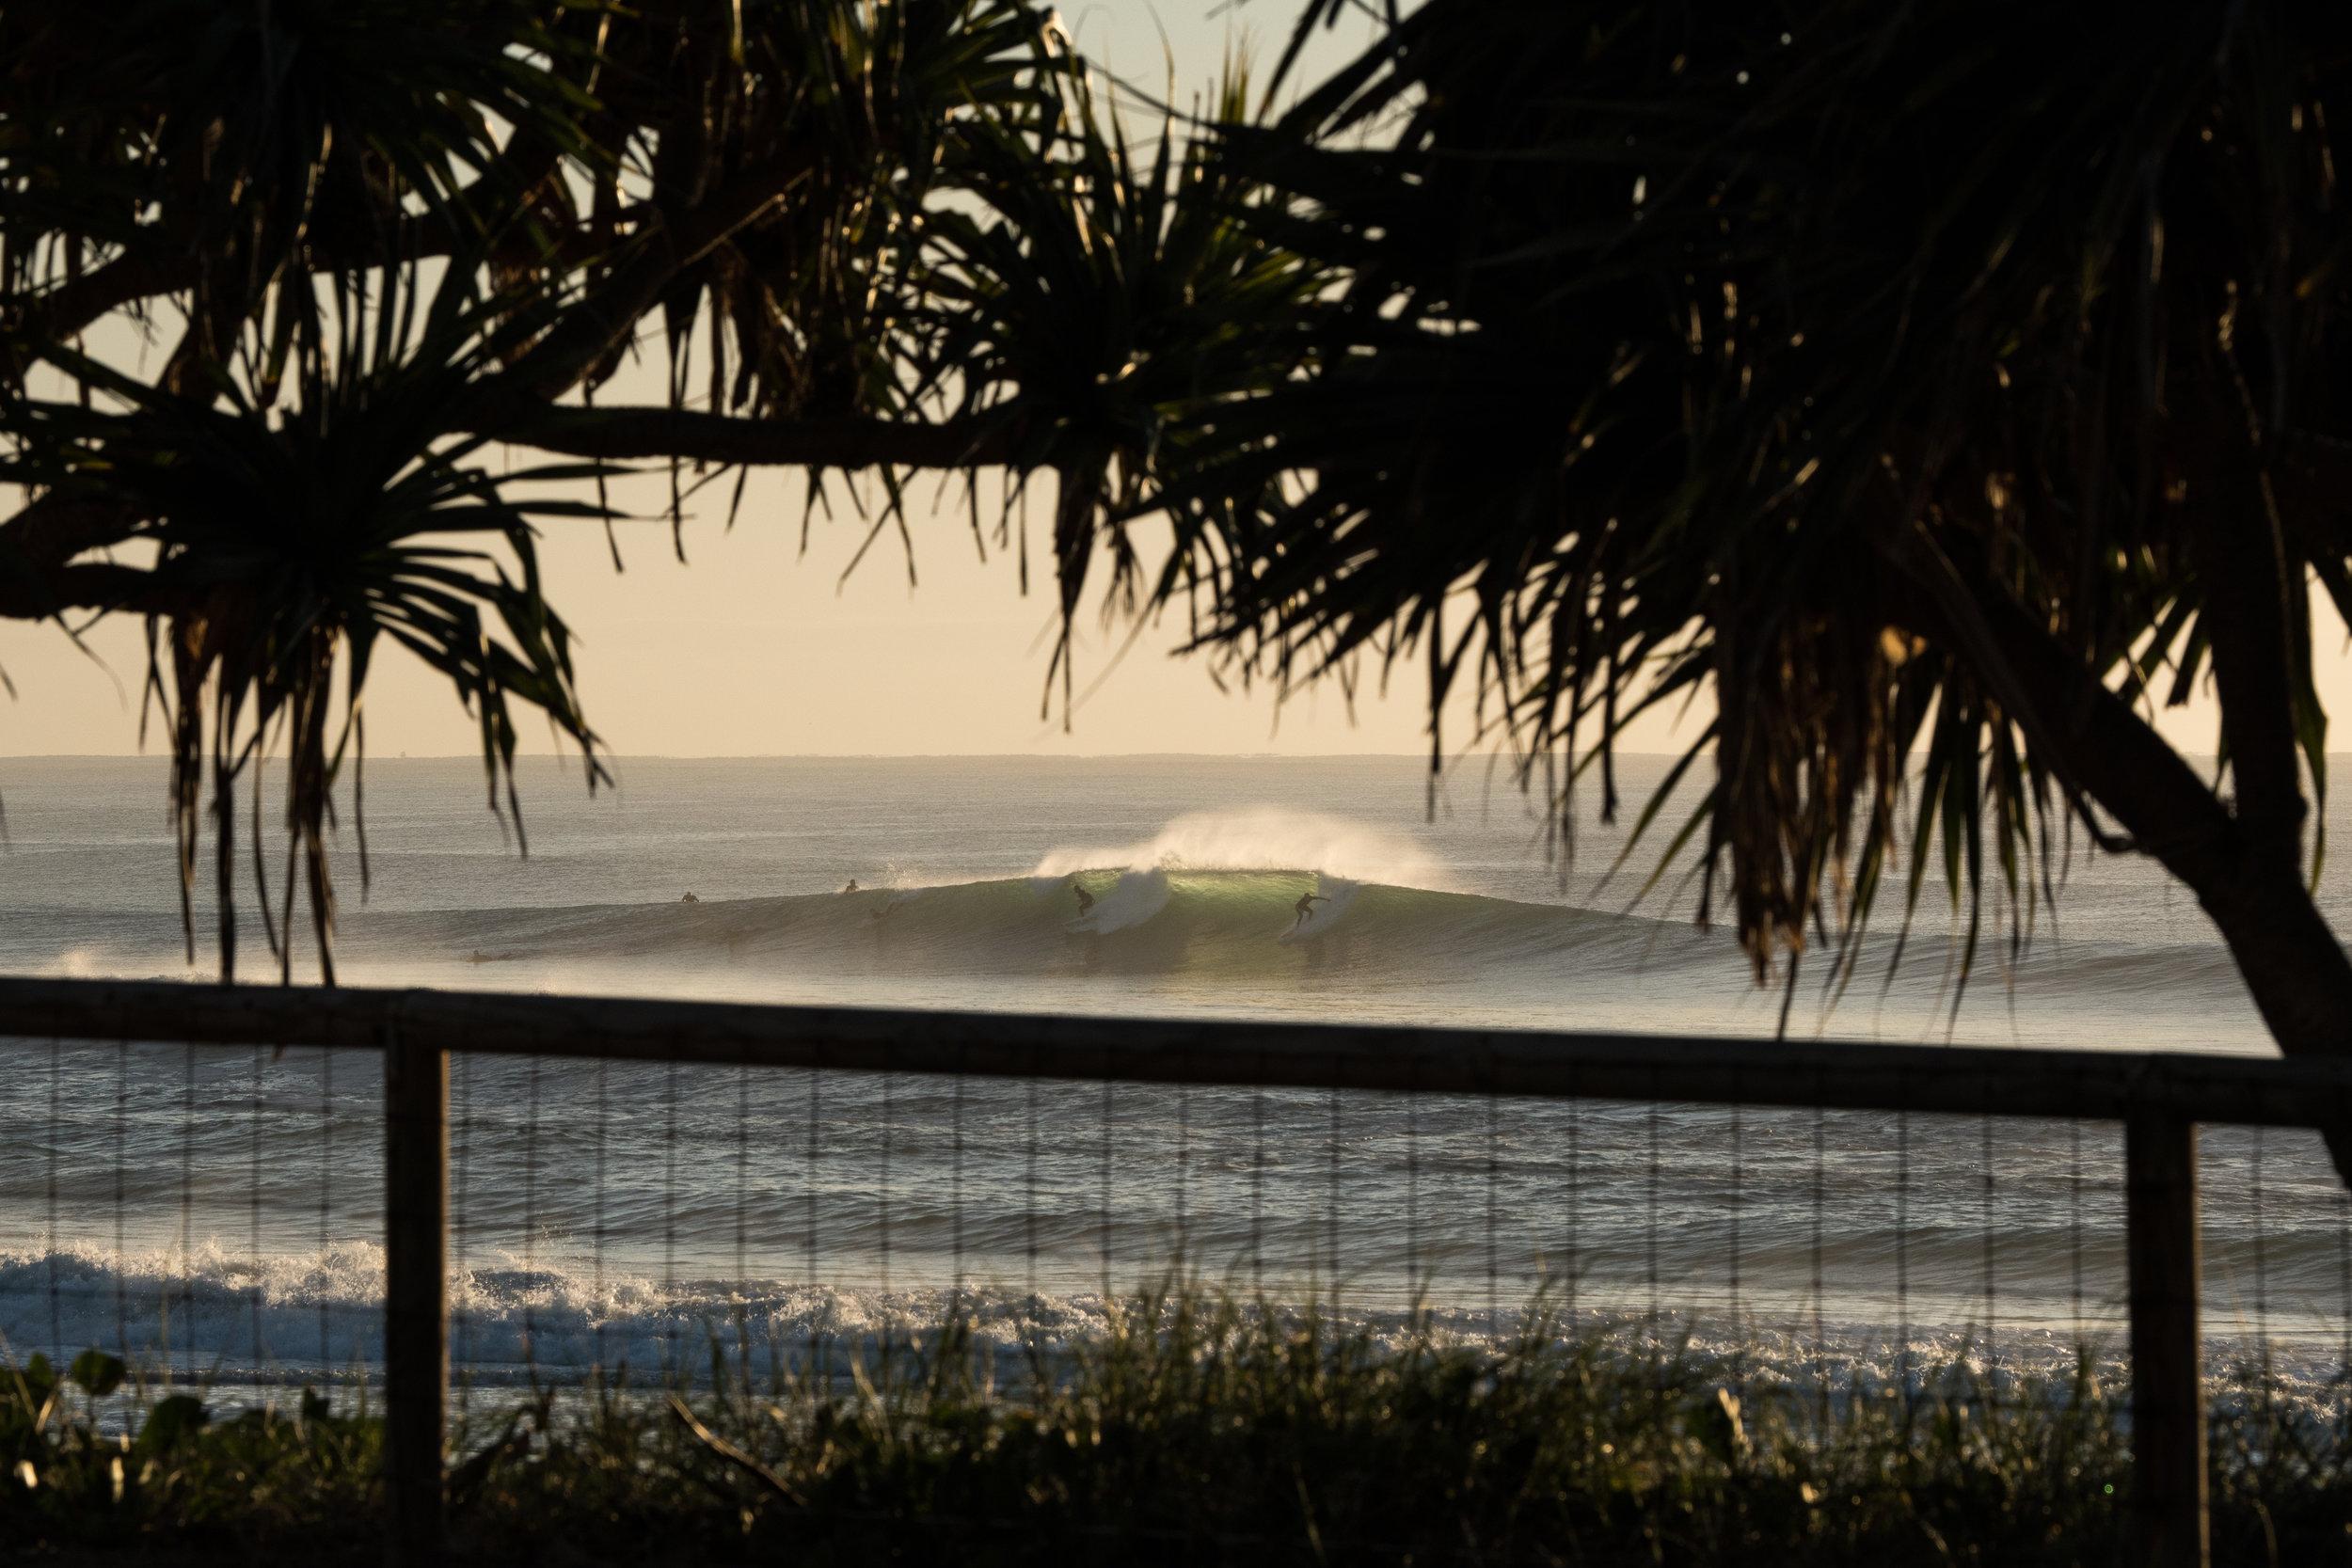 snapper_rocks_australia_saltwater_6